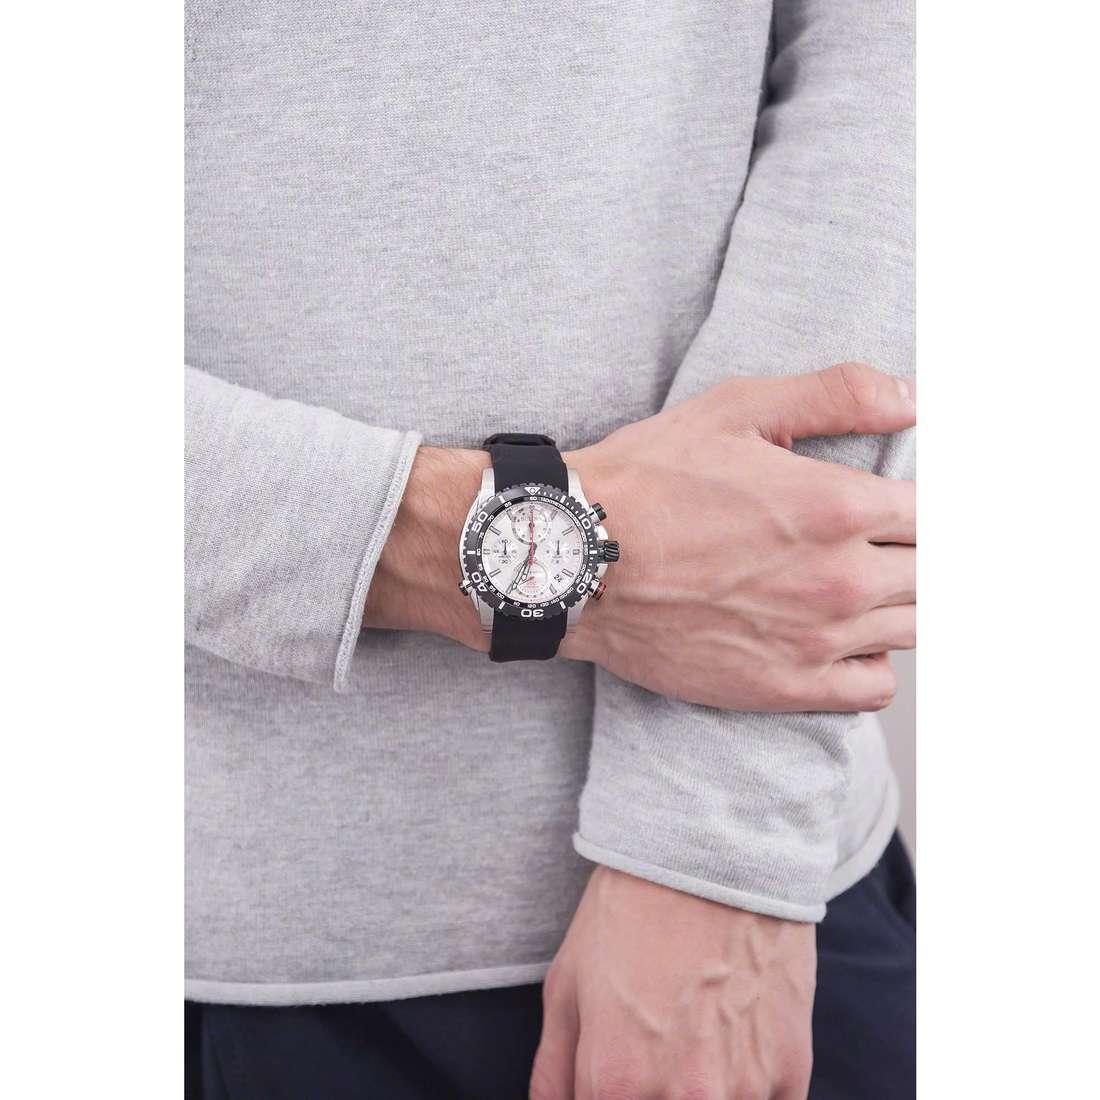 Bulova chronographes Champlain Chrono homme 98B210 photo wearing